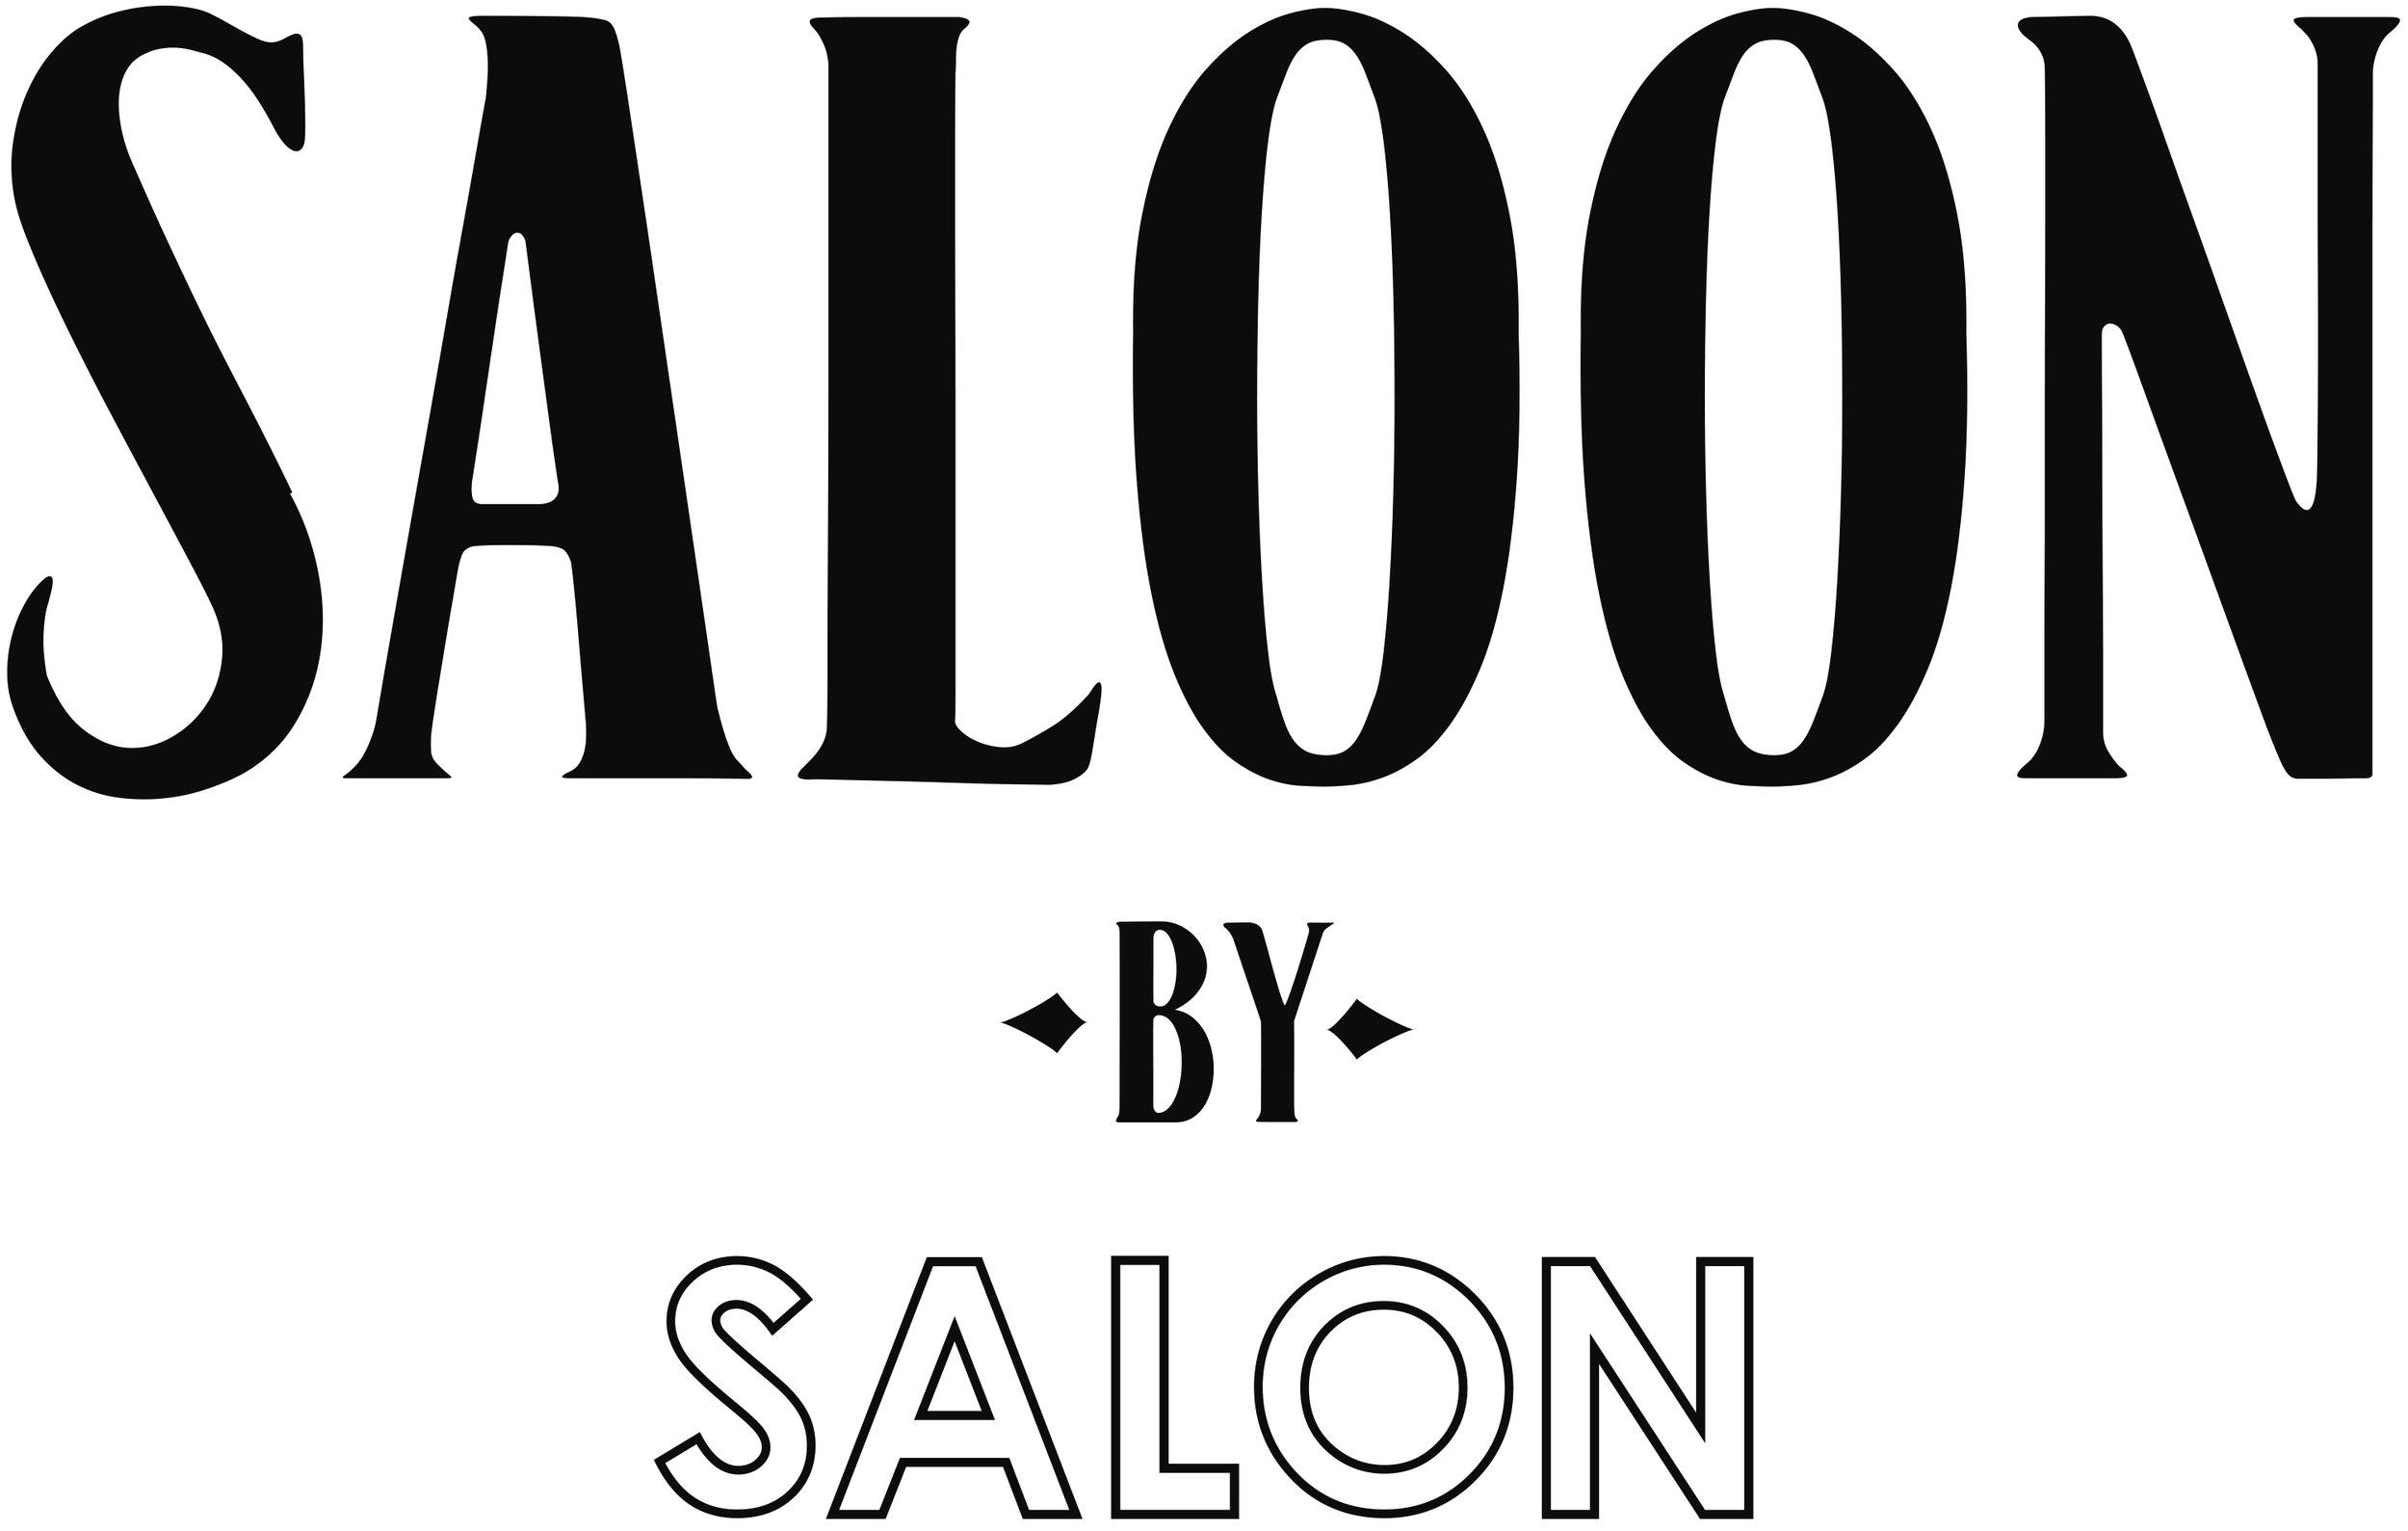 SALOON-by-SALON-identity-(BLACK).jpg